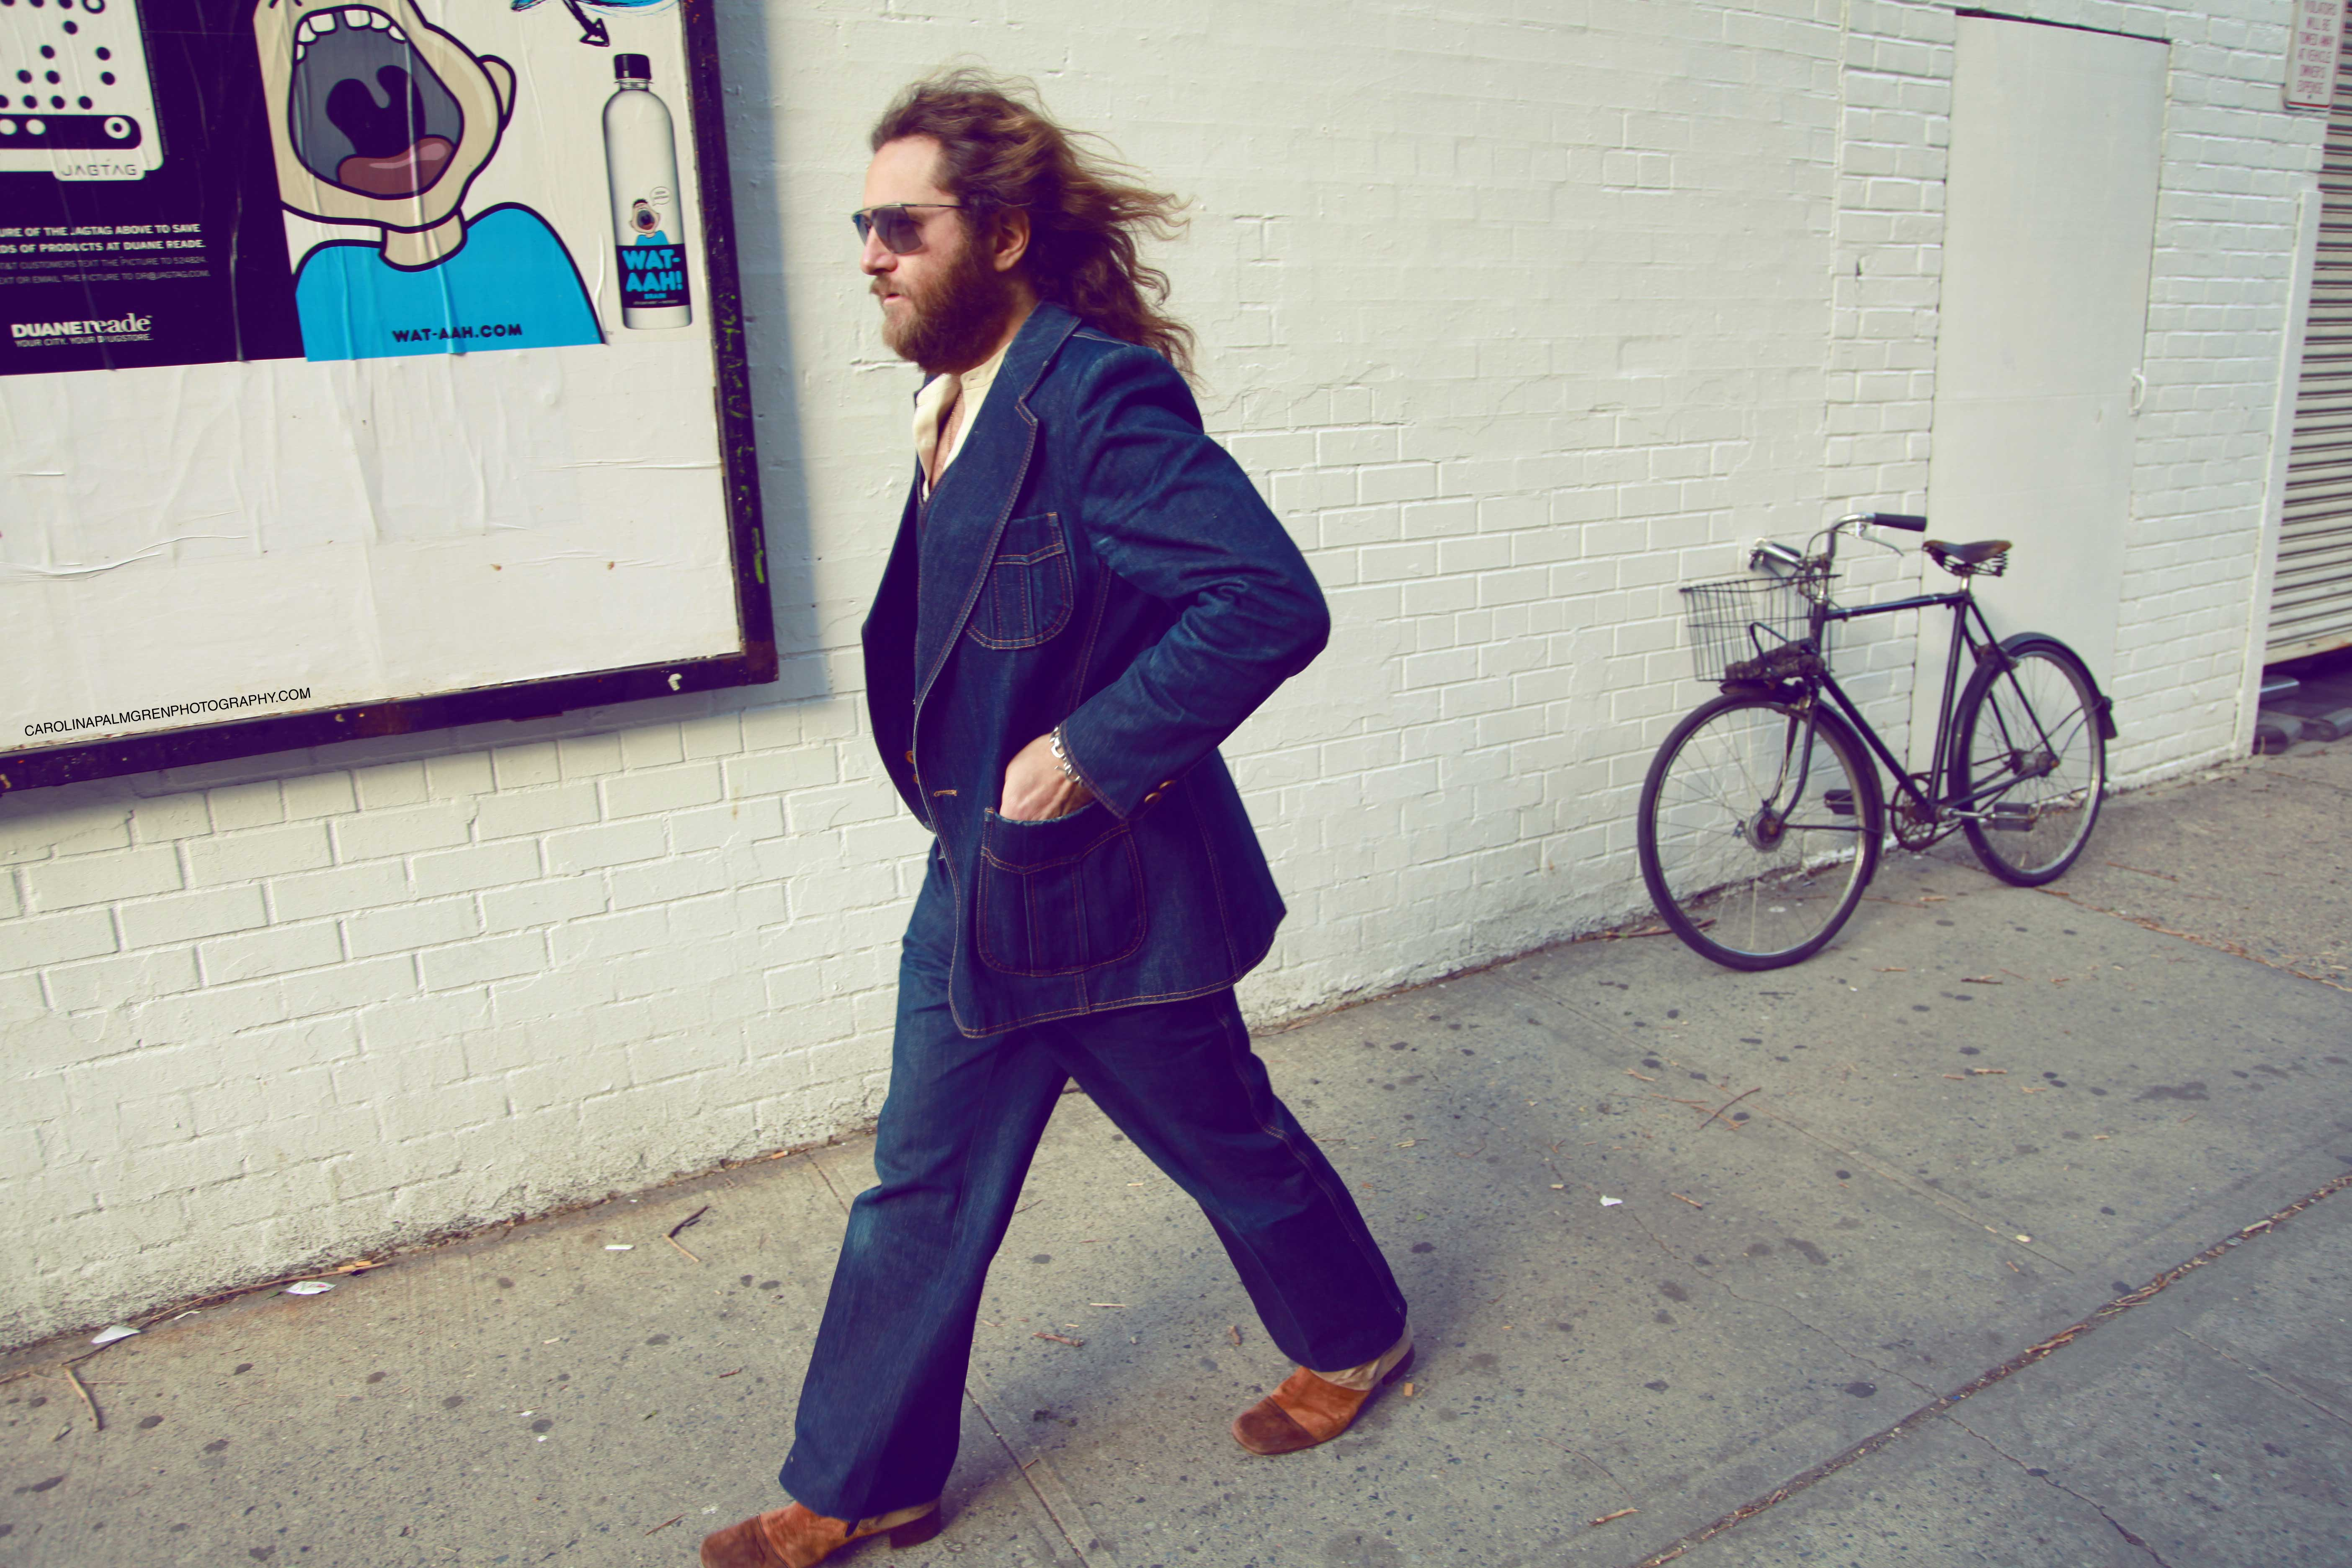 STREET LIFE...Luke has left Manhattan for Greenpoint and upstate New York